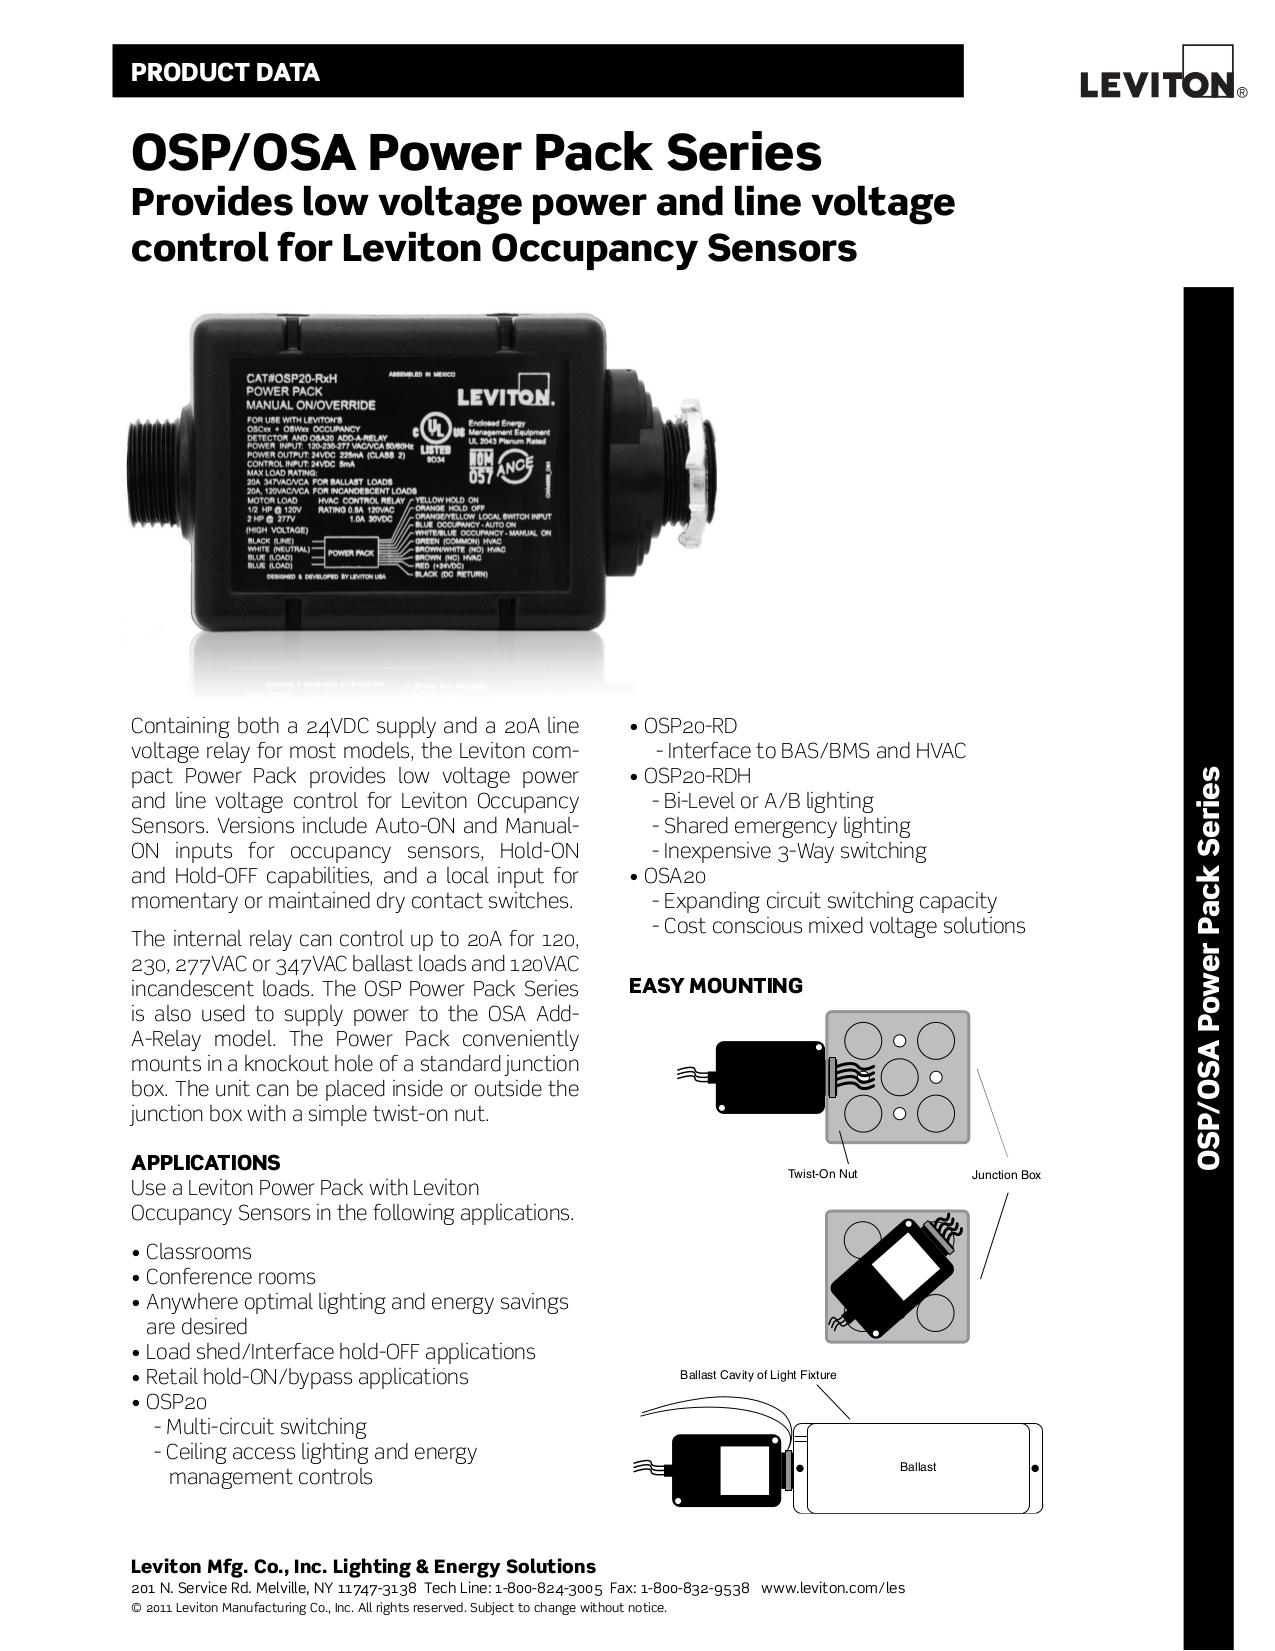 Download free pdf for Leviton OSC05-U Occupancy Sensor Other manual